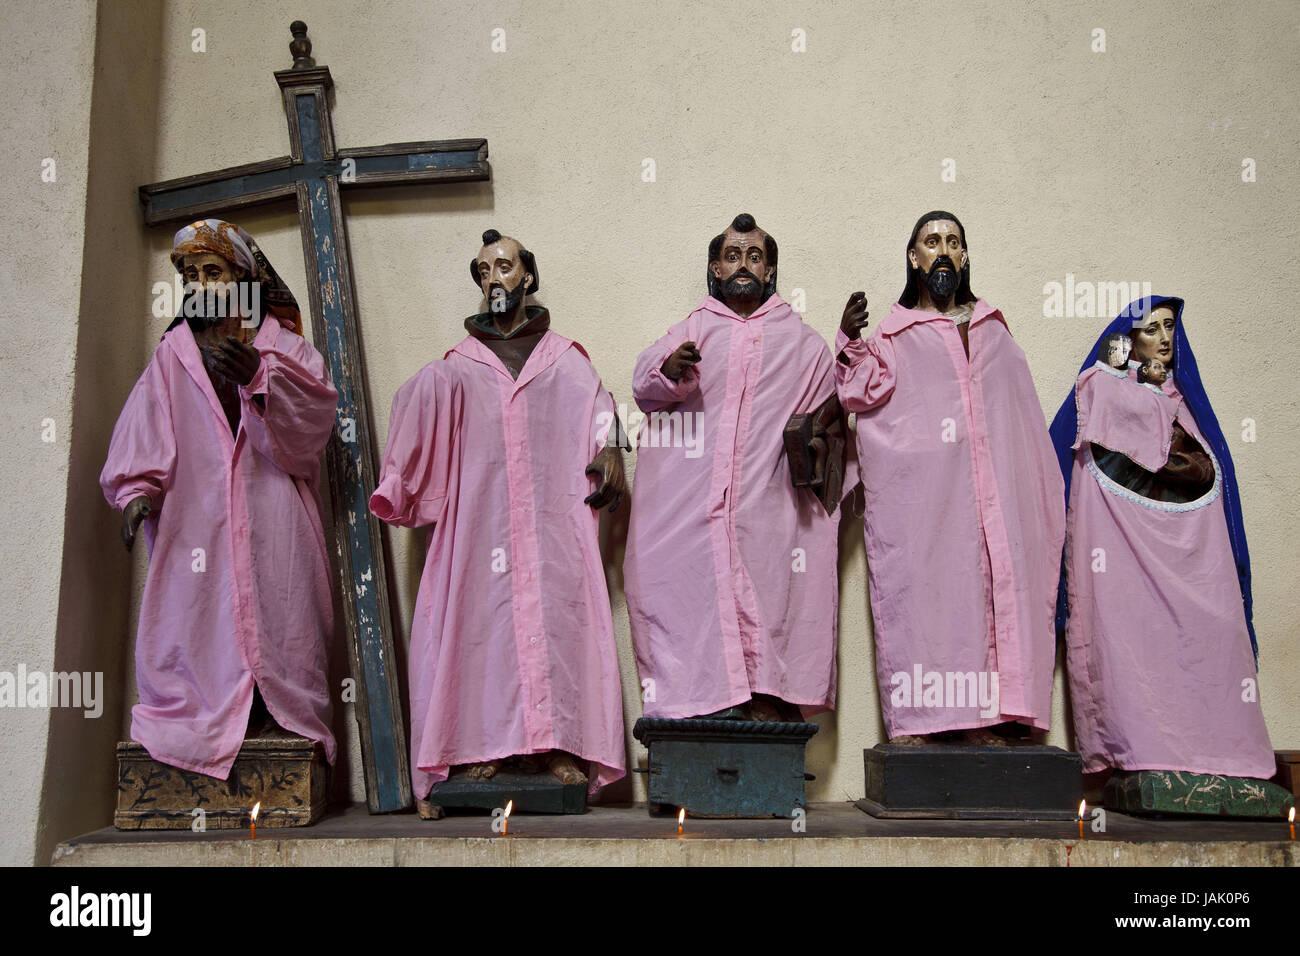 Guatemala,Atitlan lake,church,Santiago Atitlan,saints,no property release, - Stock Image